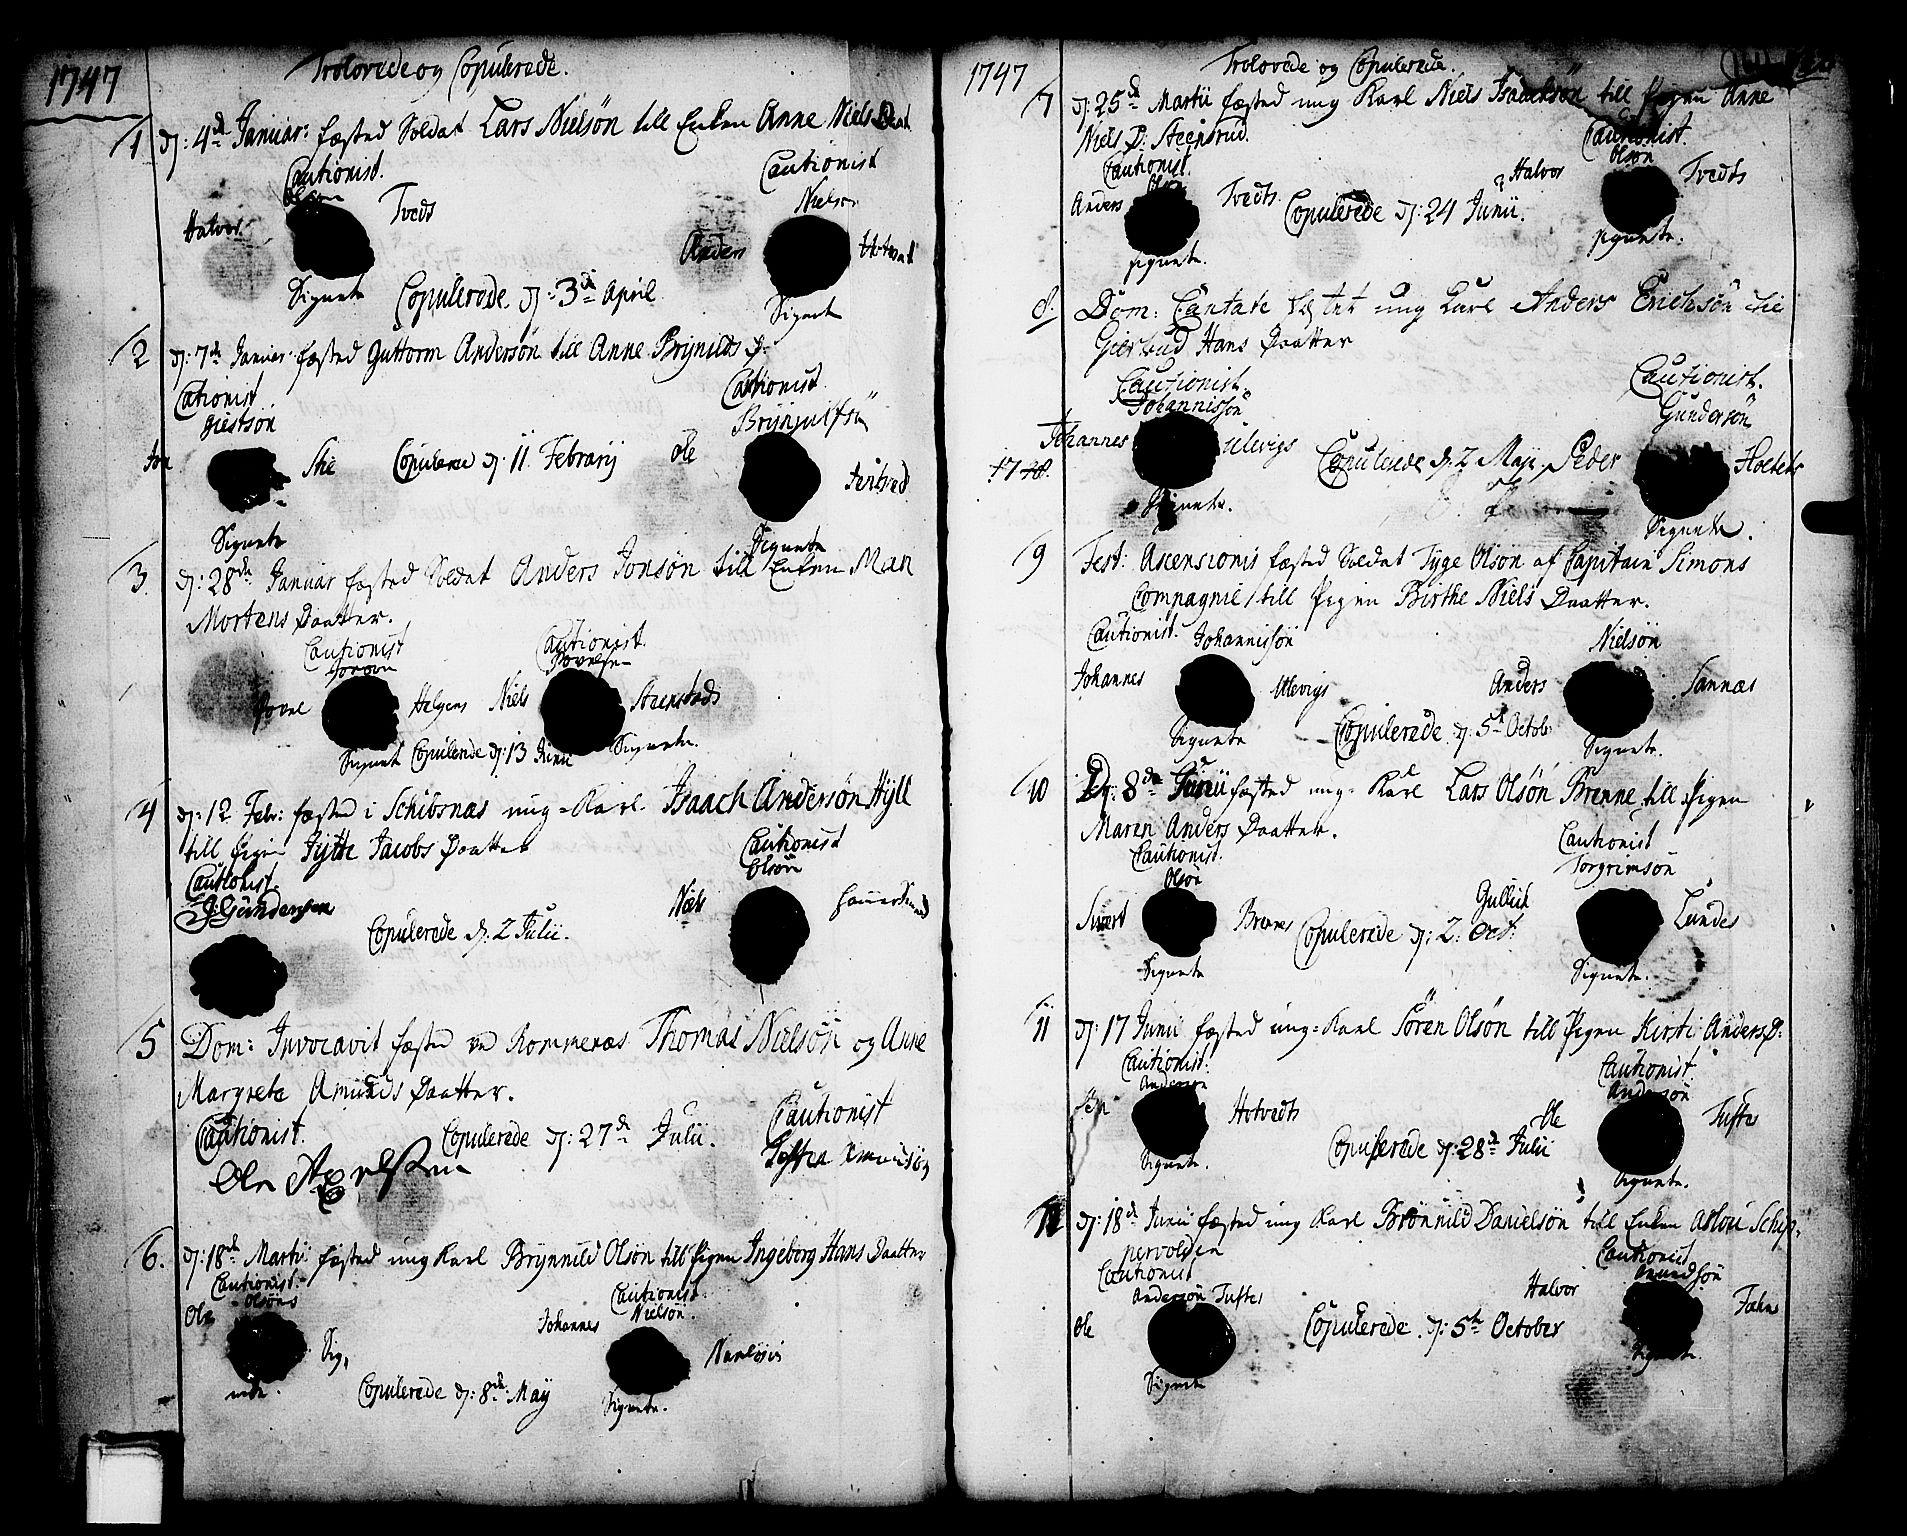 SAKO, Holla kirkebøker, F/Fa/L0001: Ministerialbok nr. 1, 1717-1779, s. 161